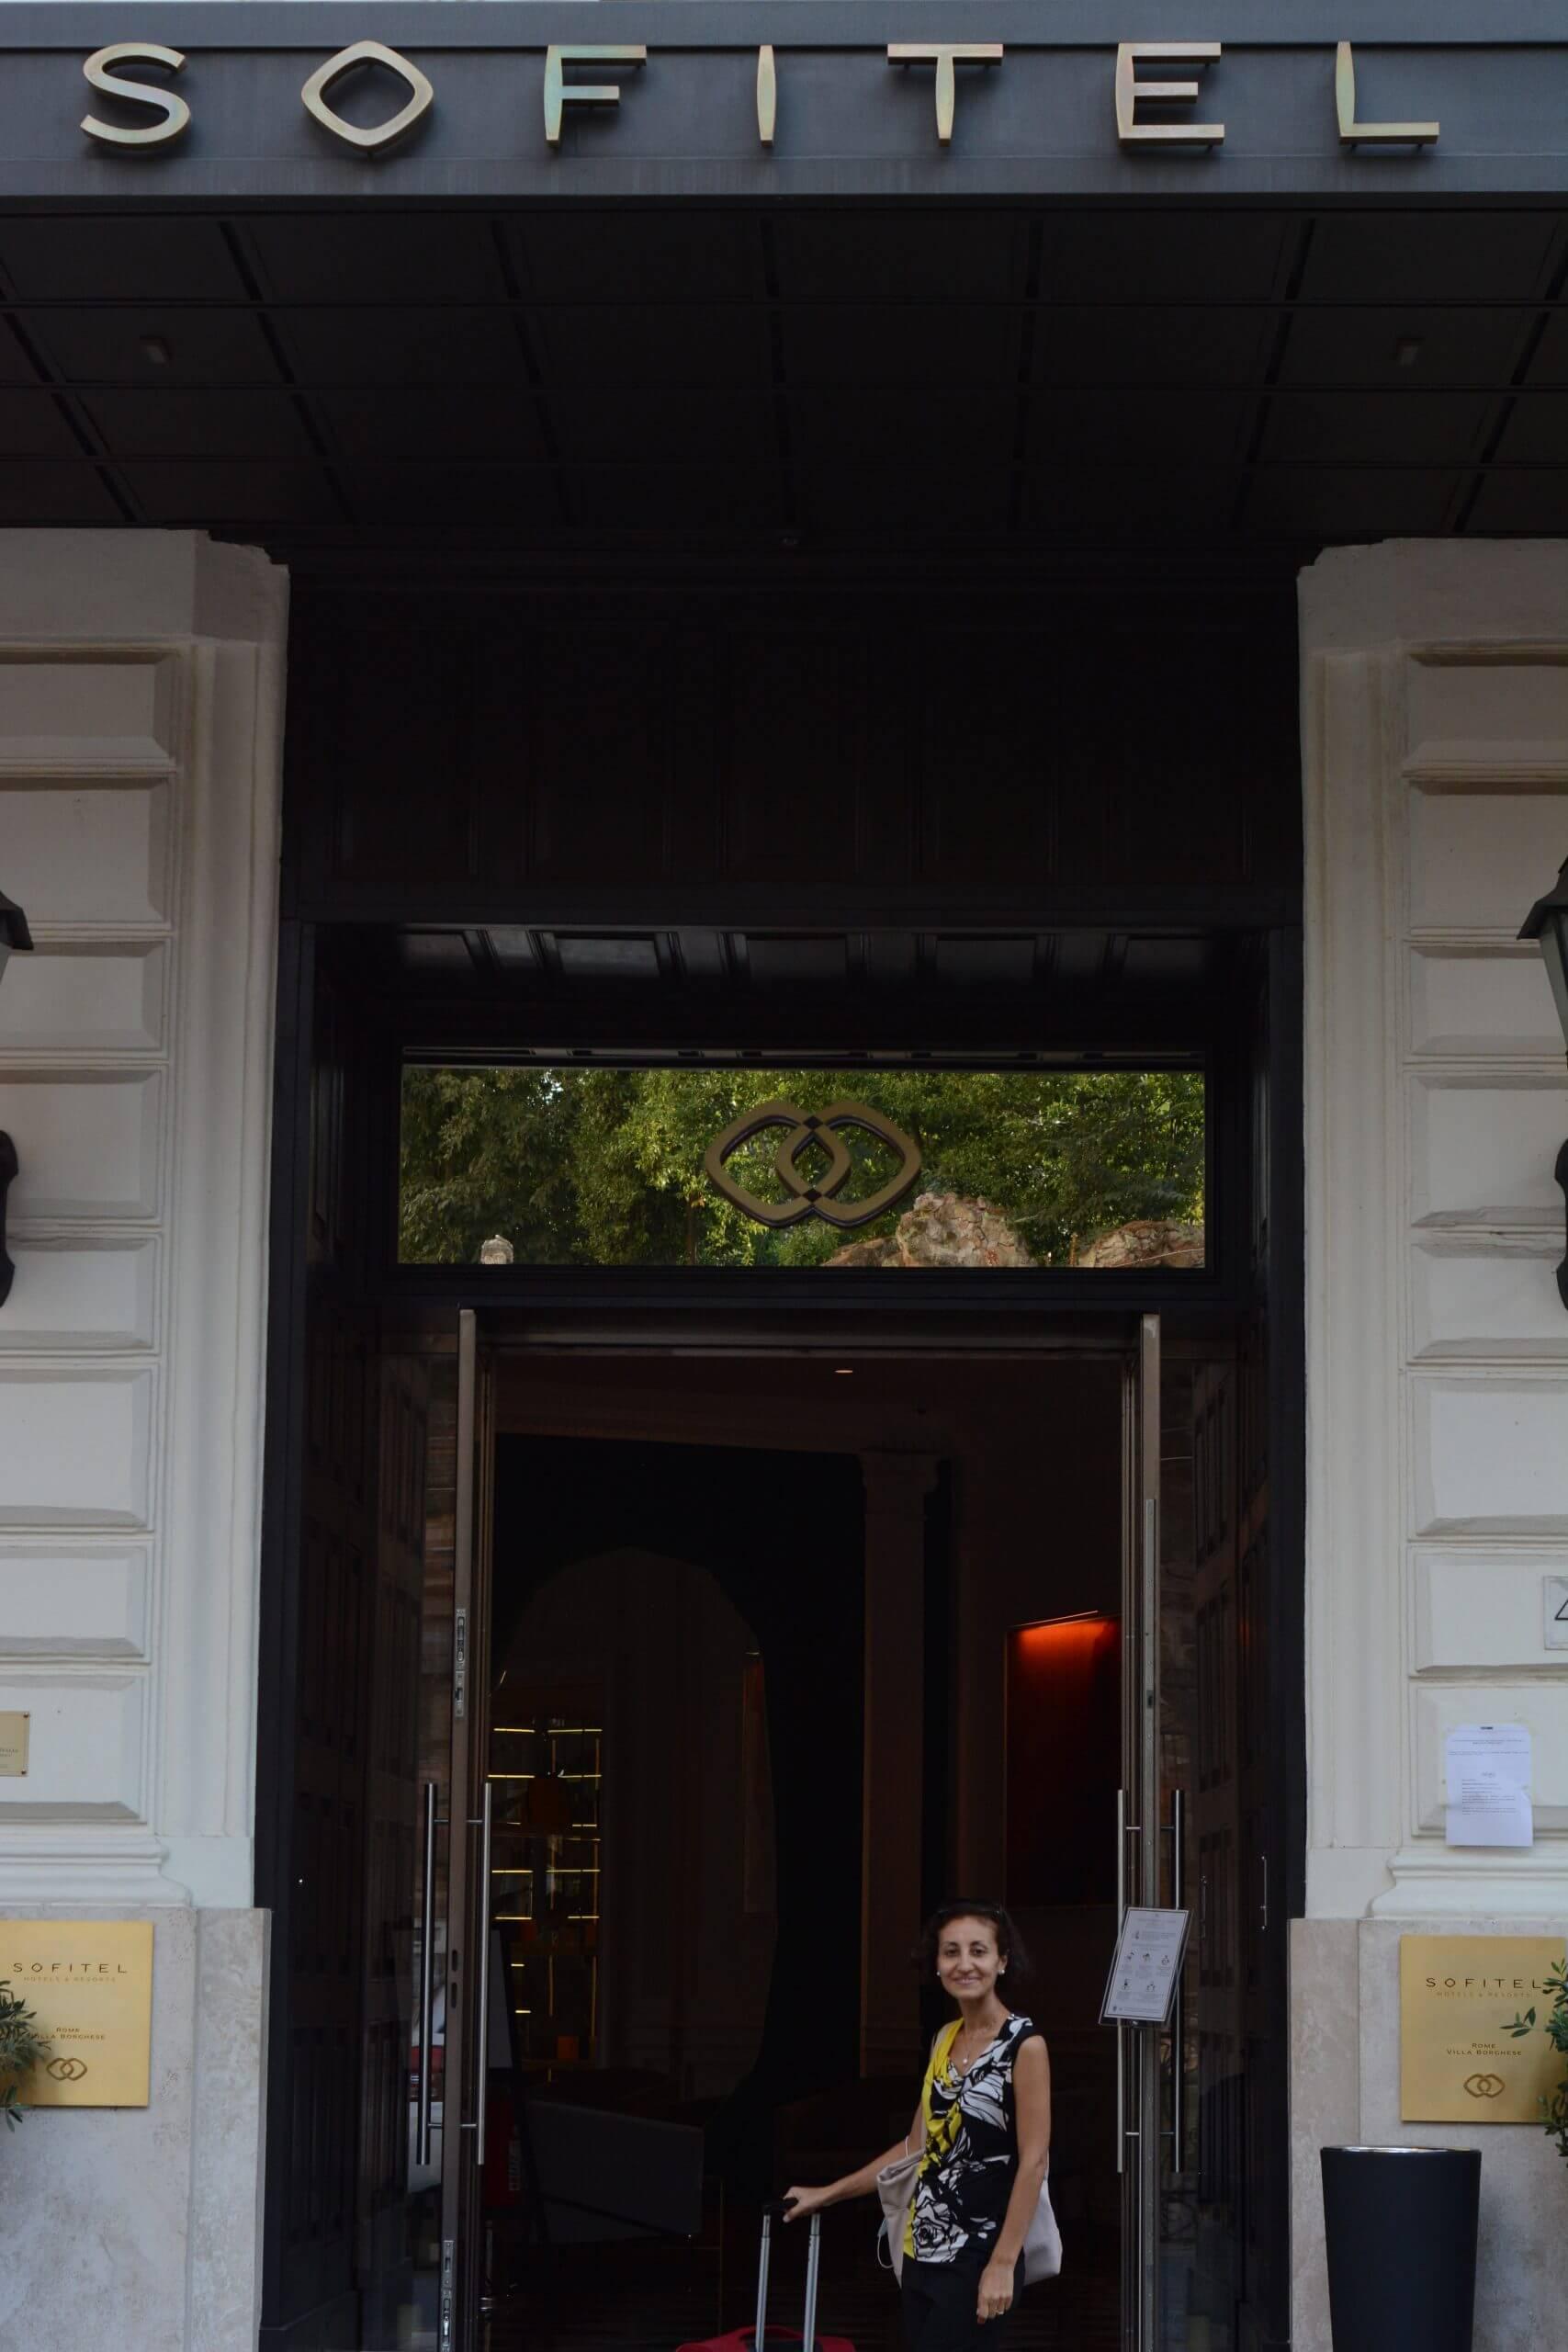 Entrance: Lobby of Sofitel Rome Villa Borghese